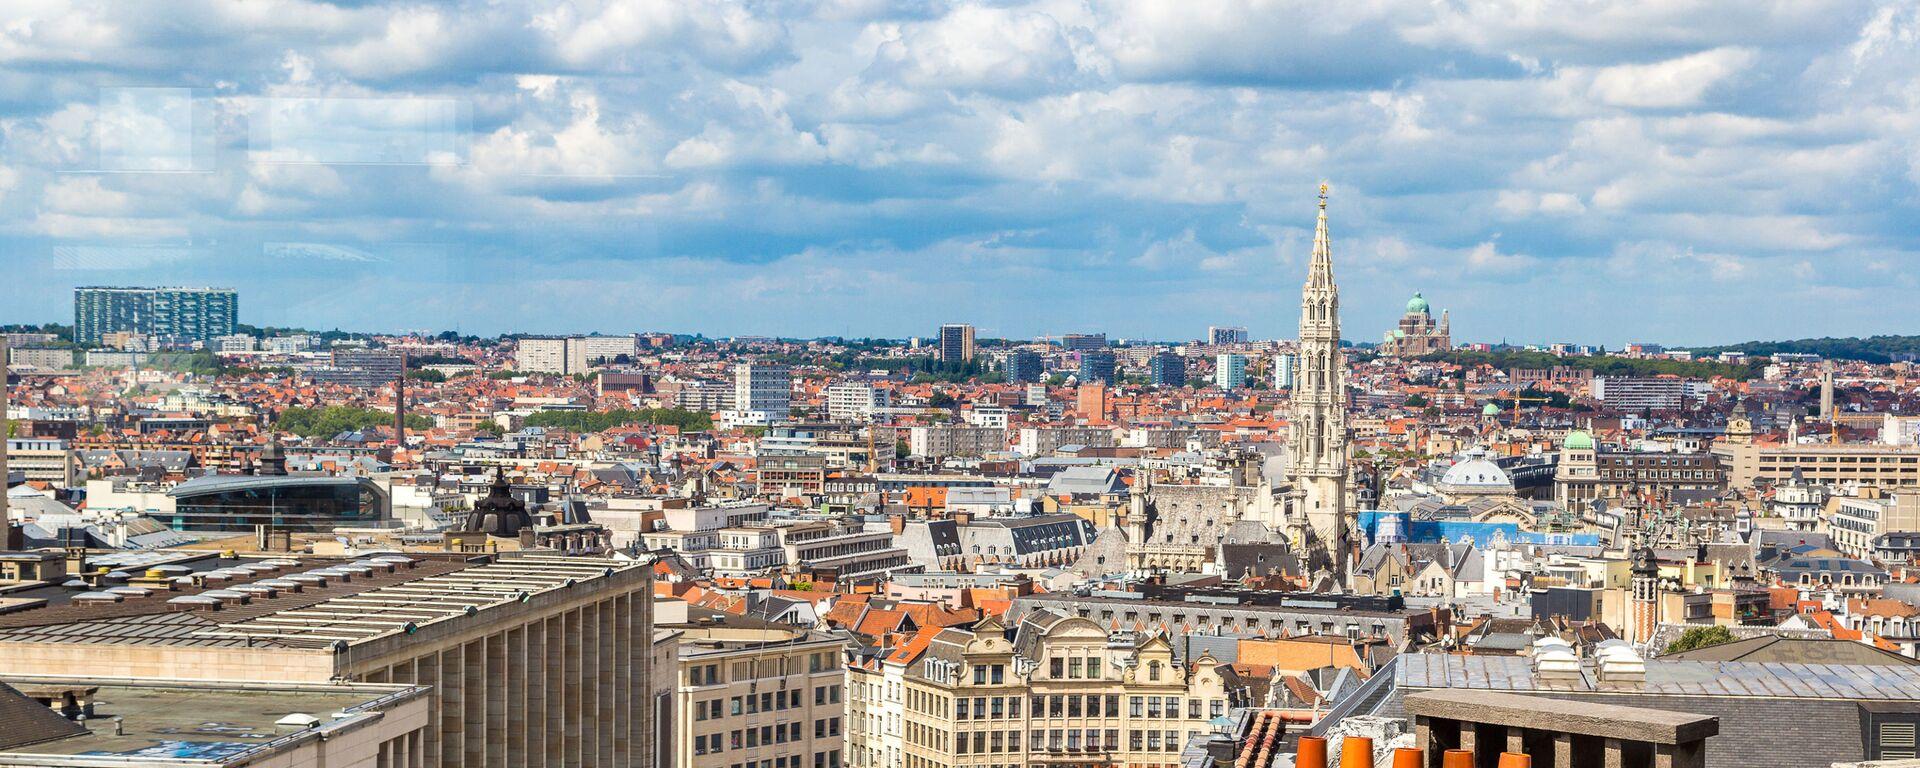 Widok na Brukselę, Belgia - Sputnik Polska, 1920, 26.07.2021